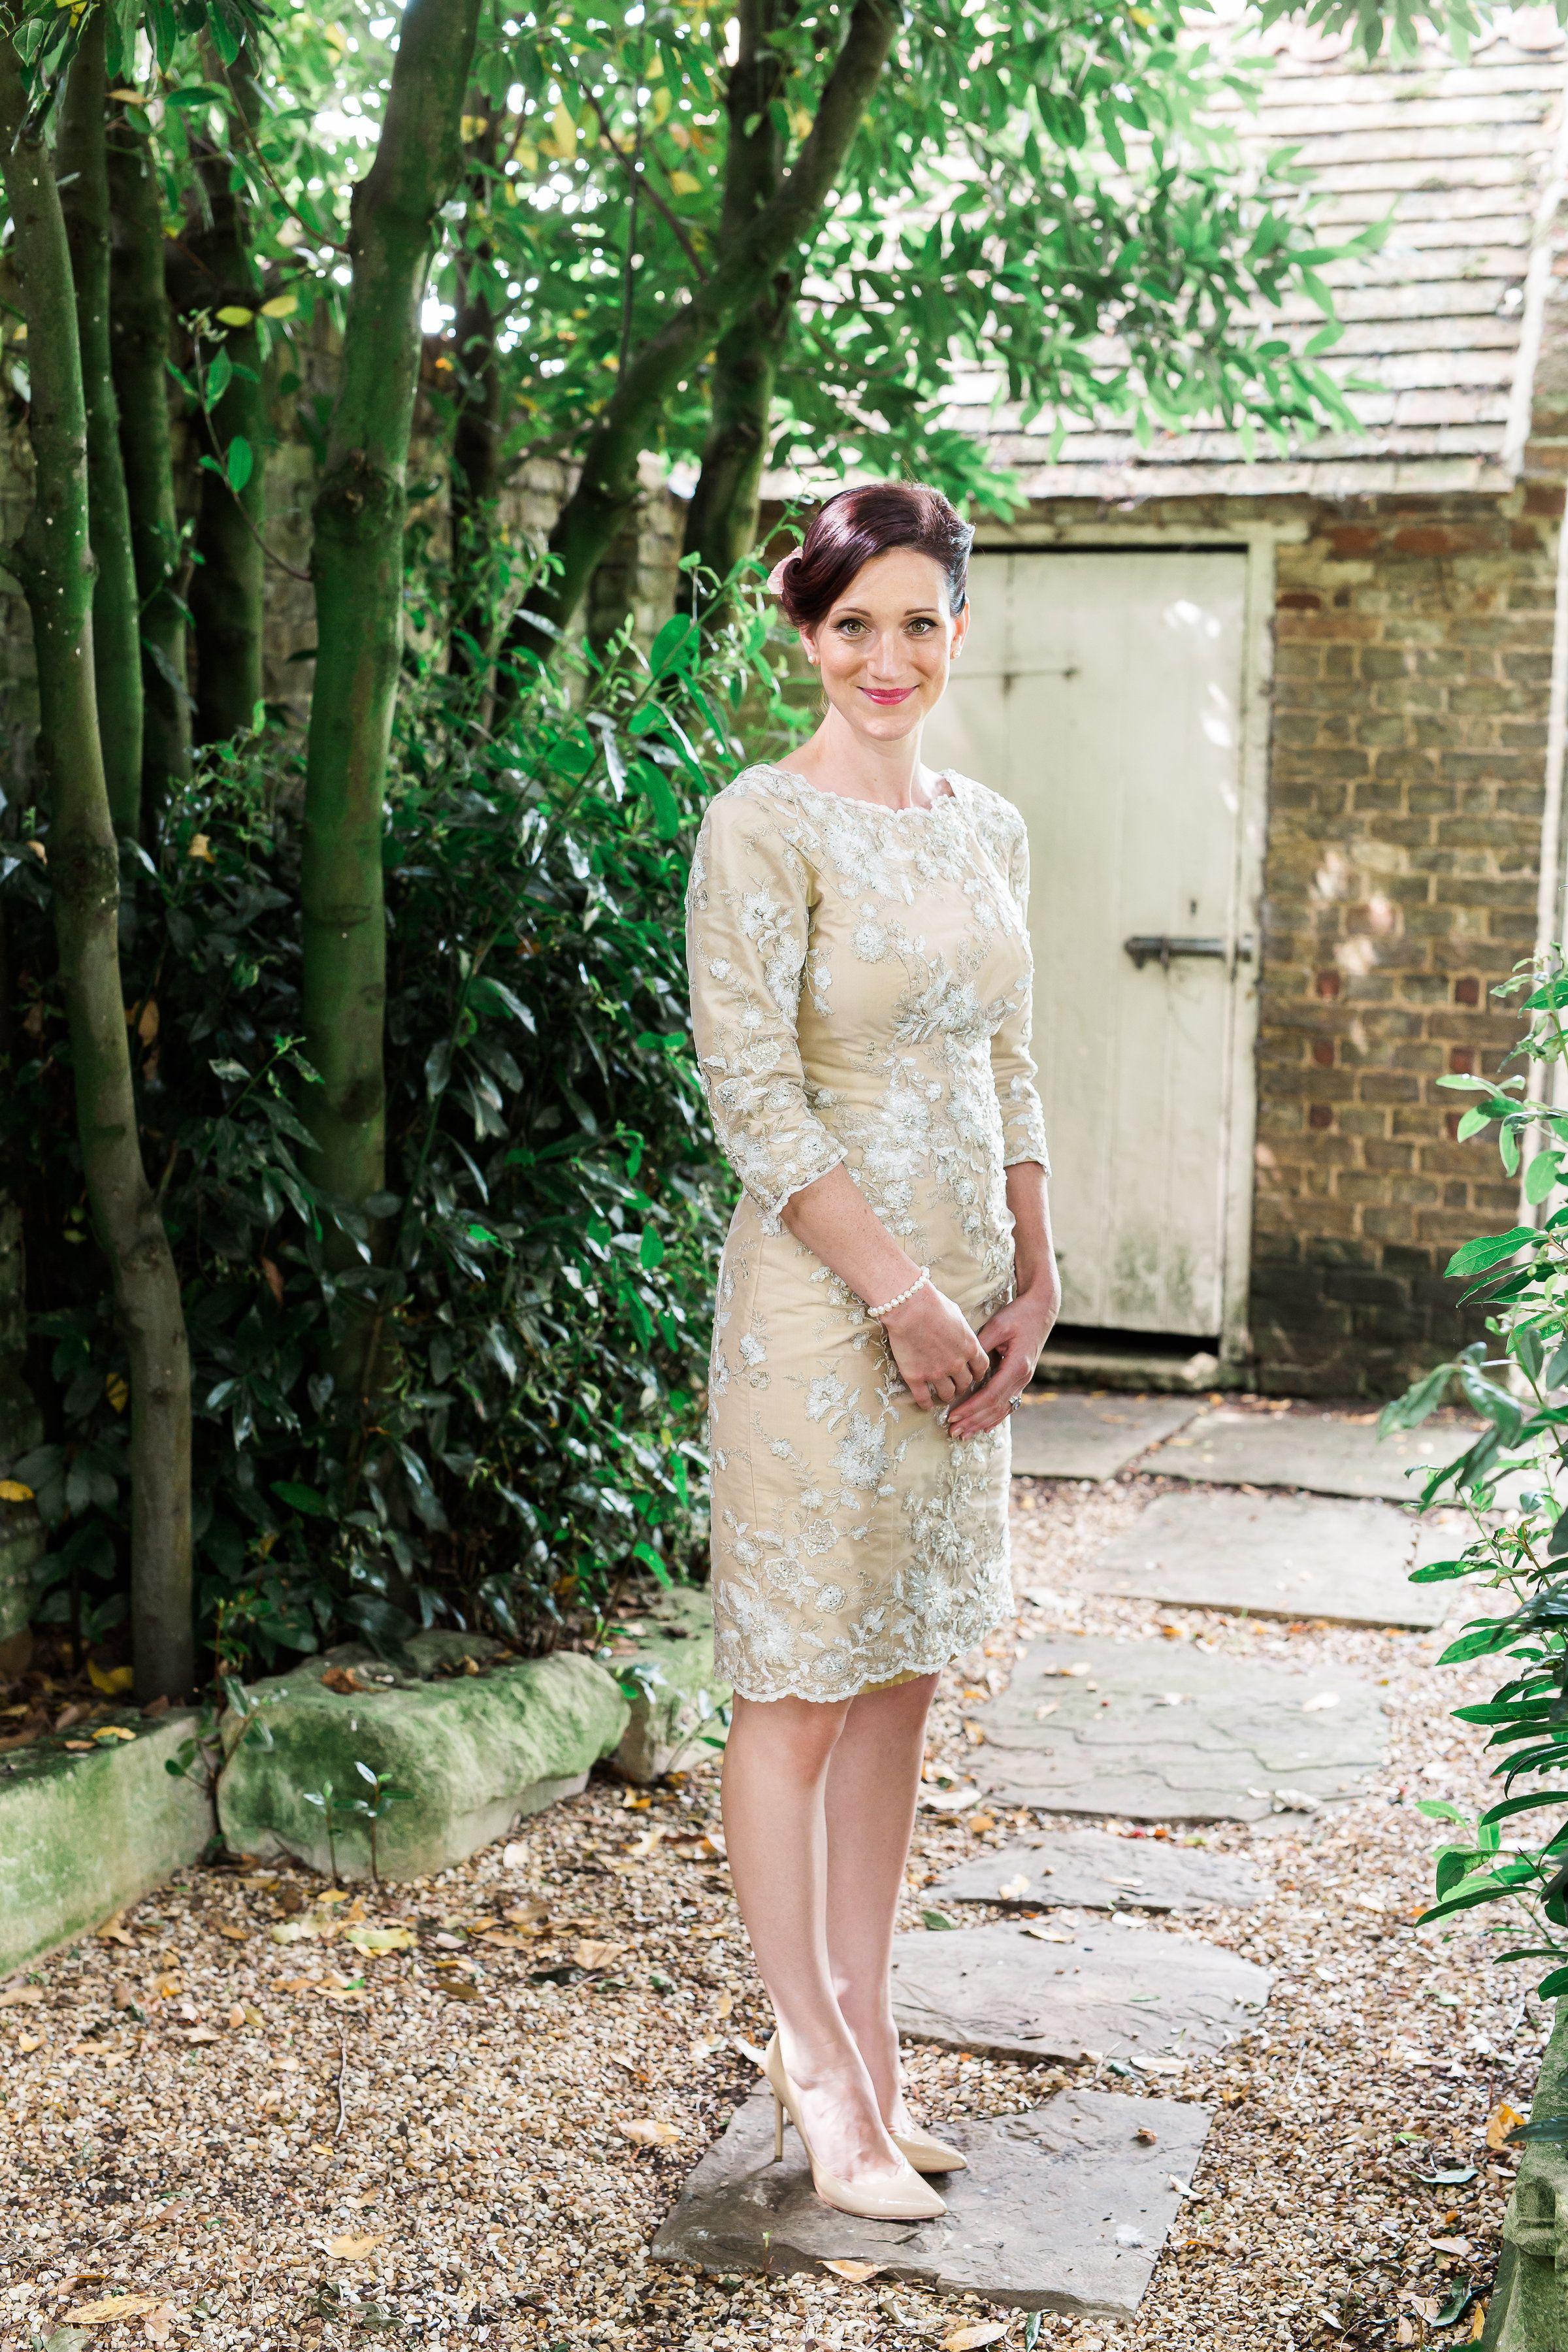 Bespoke Occasion Wear By Rachel Lamb Design Lace Over Silk Dupion Knee Length Dress Photo By Sarahbrookesphotog Designer Wedding Dresses